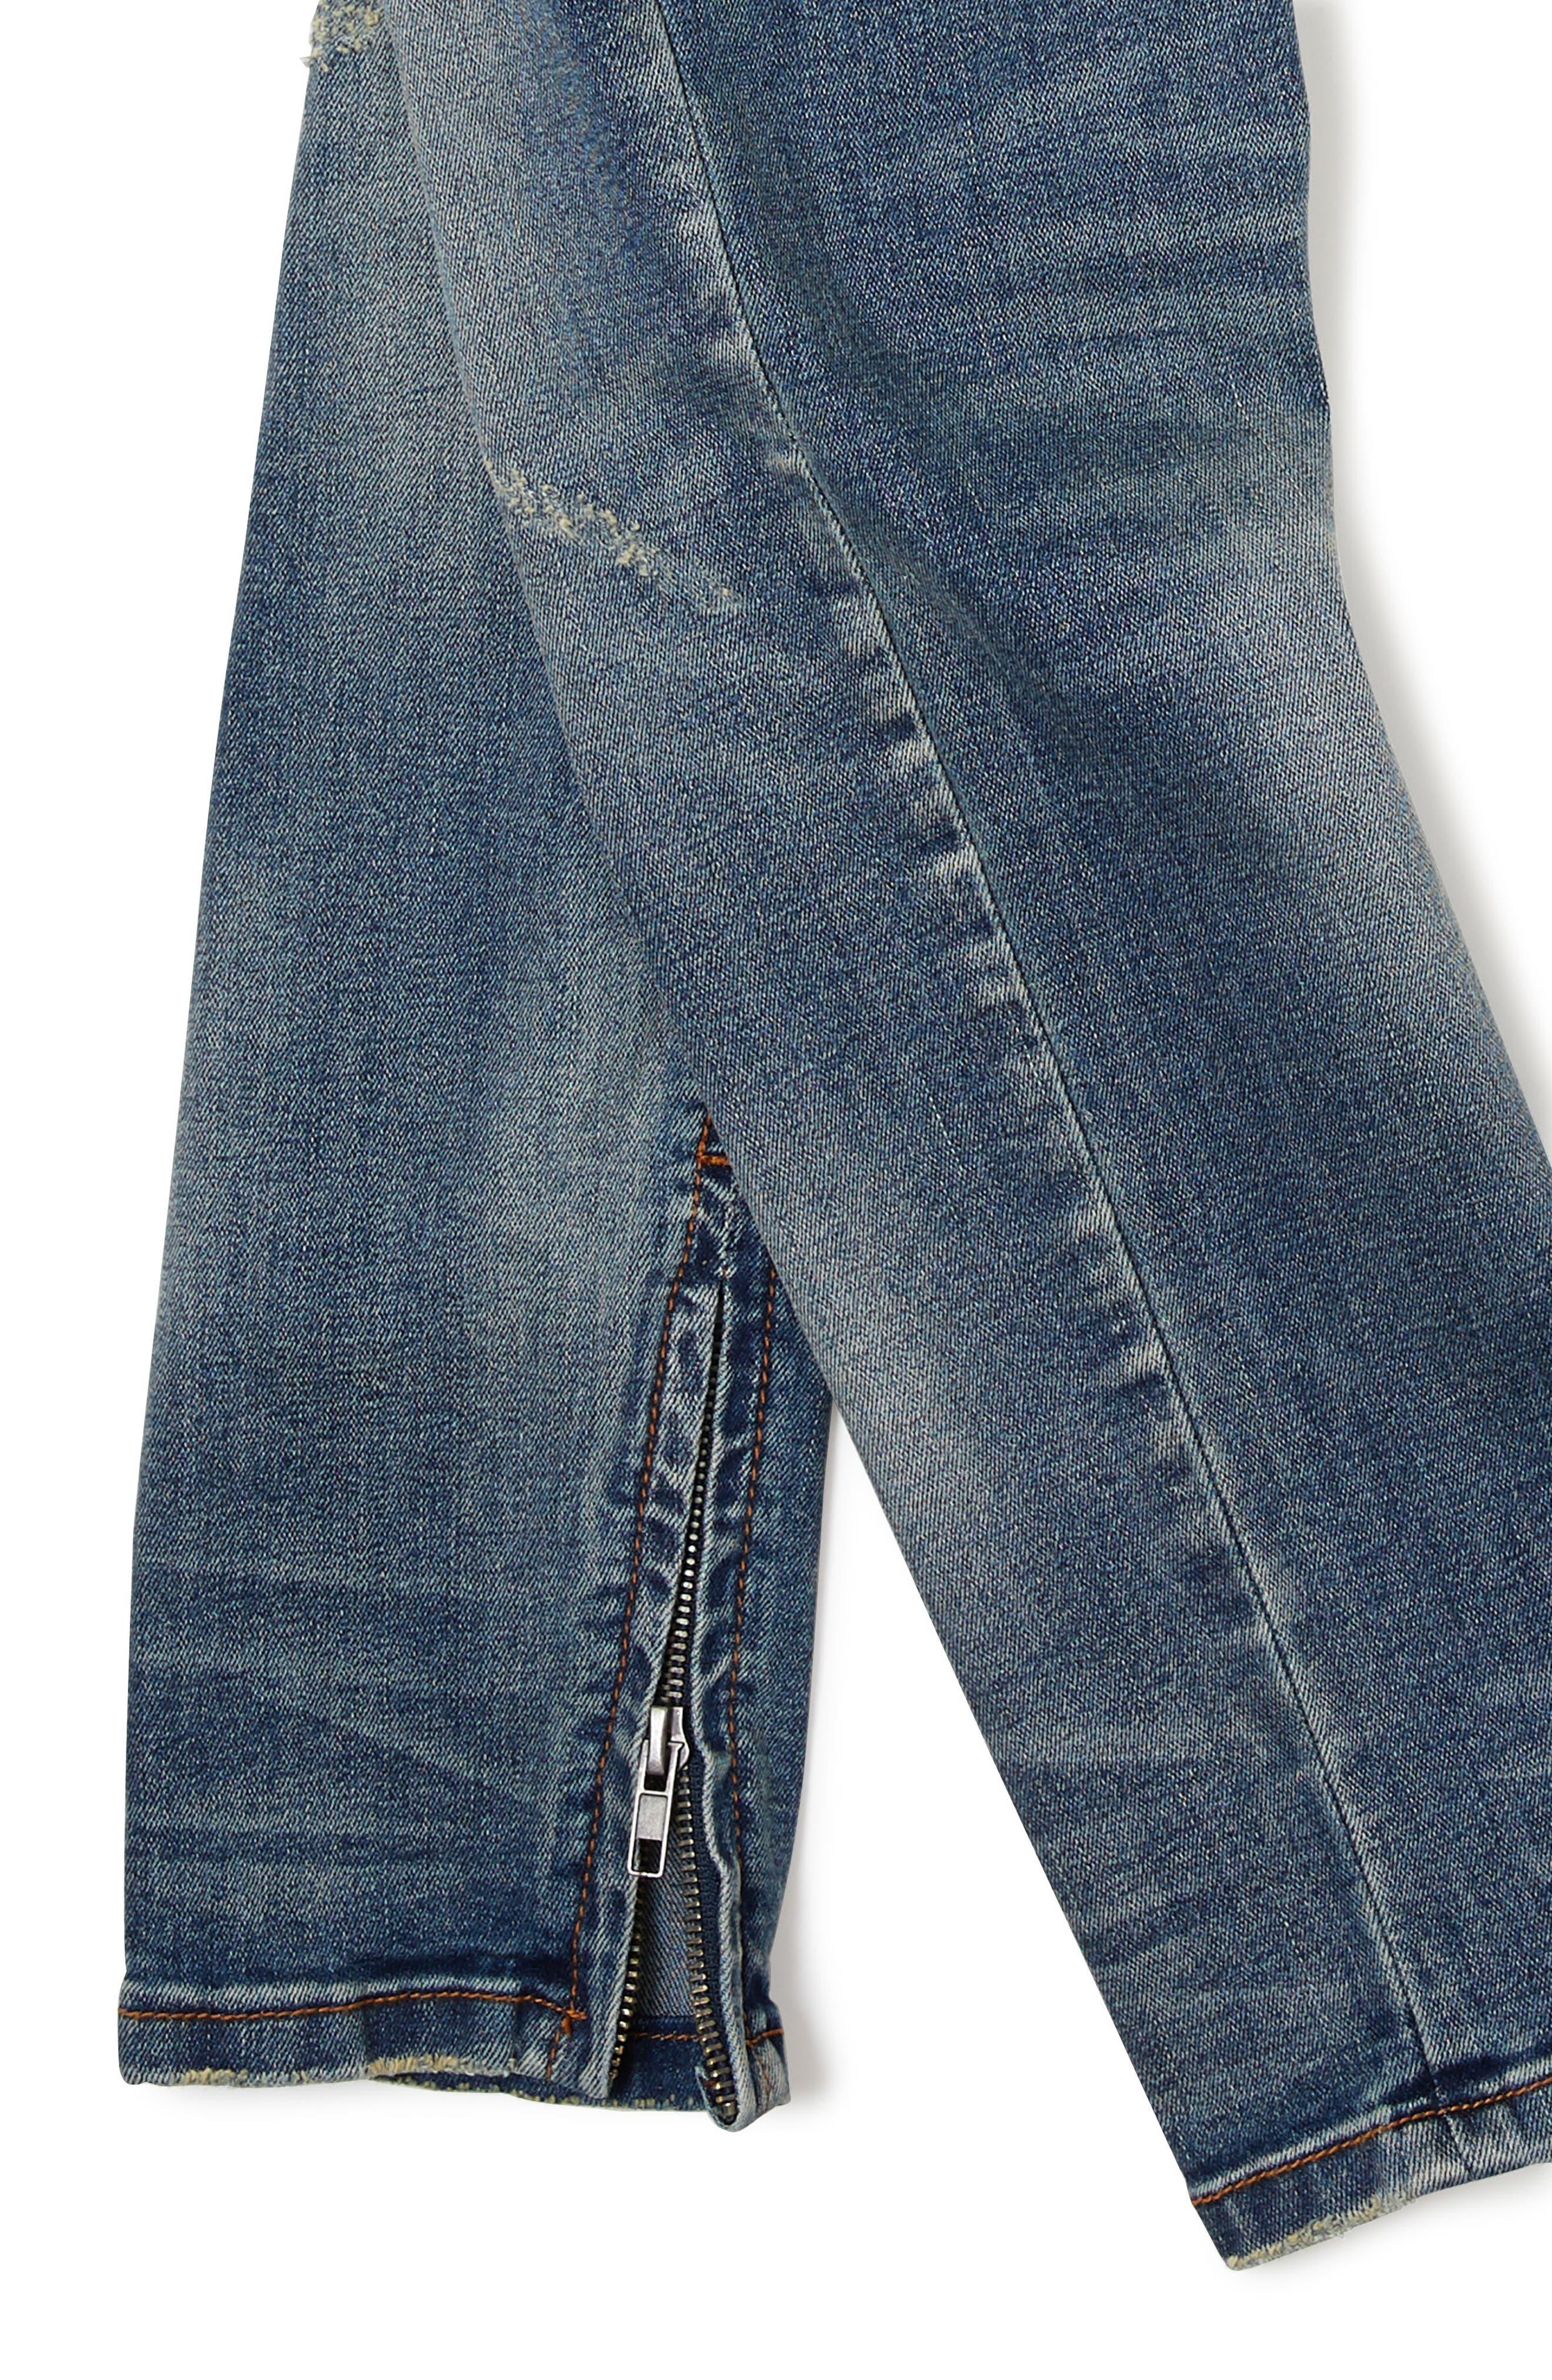 Sand Blasted Moto Skinny Jeans Big Boys),                             Alternate thumbnail 3, color,                             Dark Wash Denim